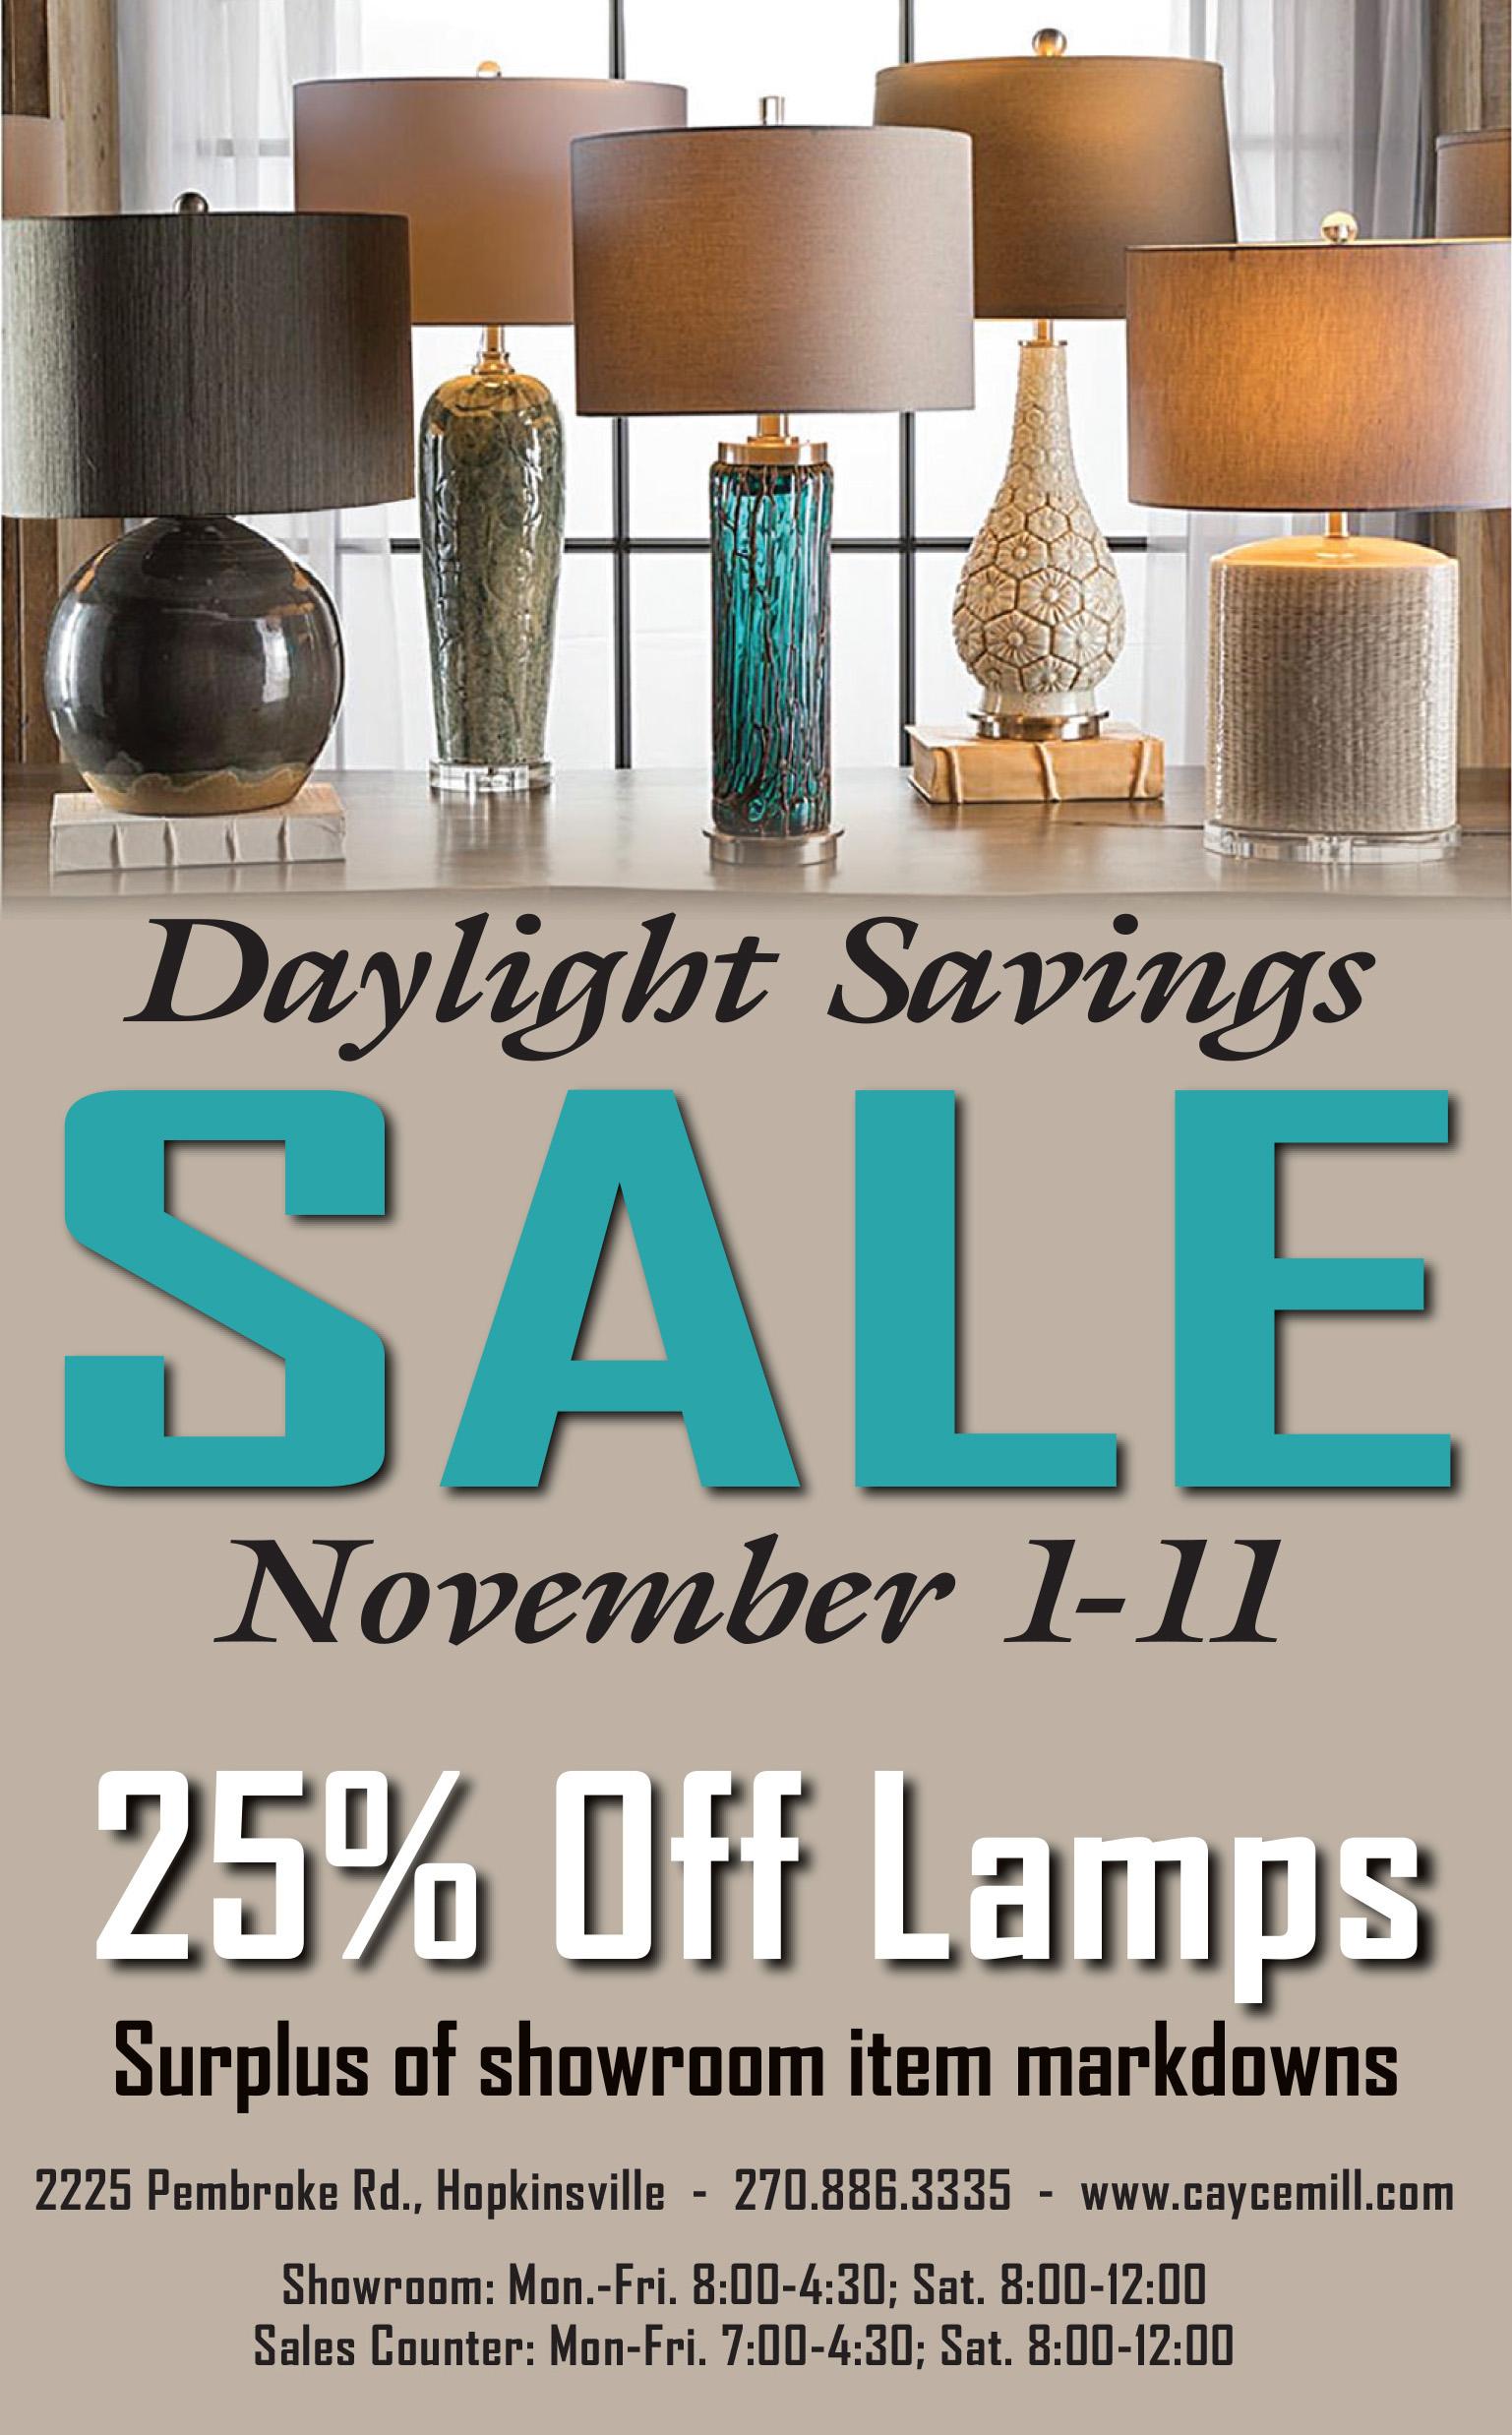 Design Center – Daylight Savings Sale